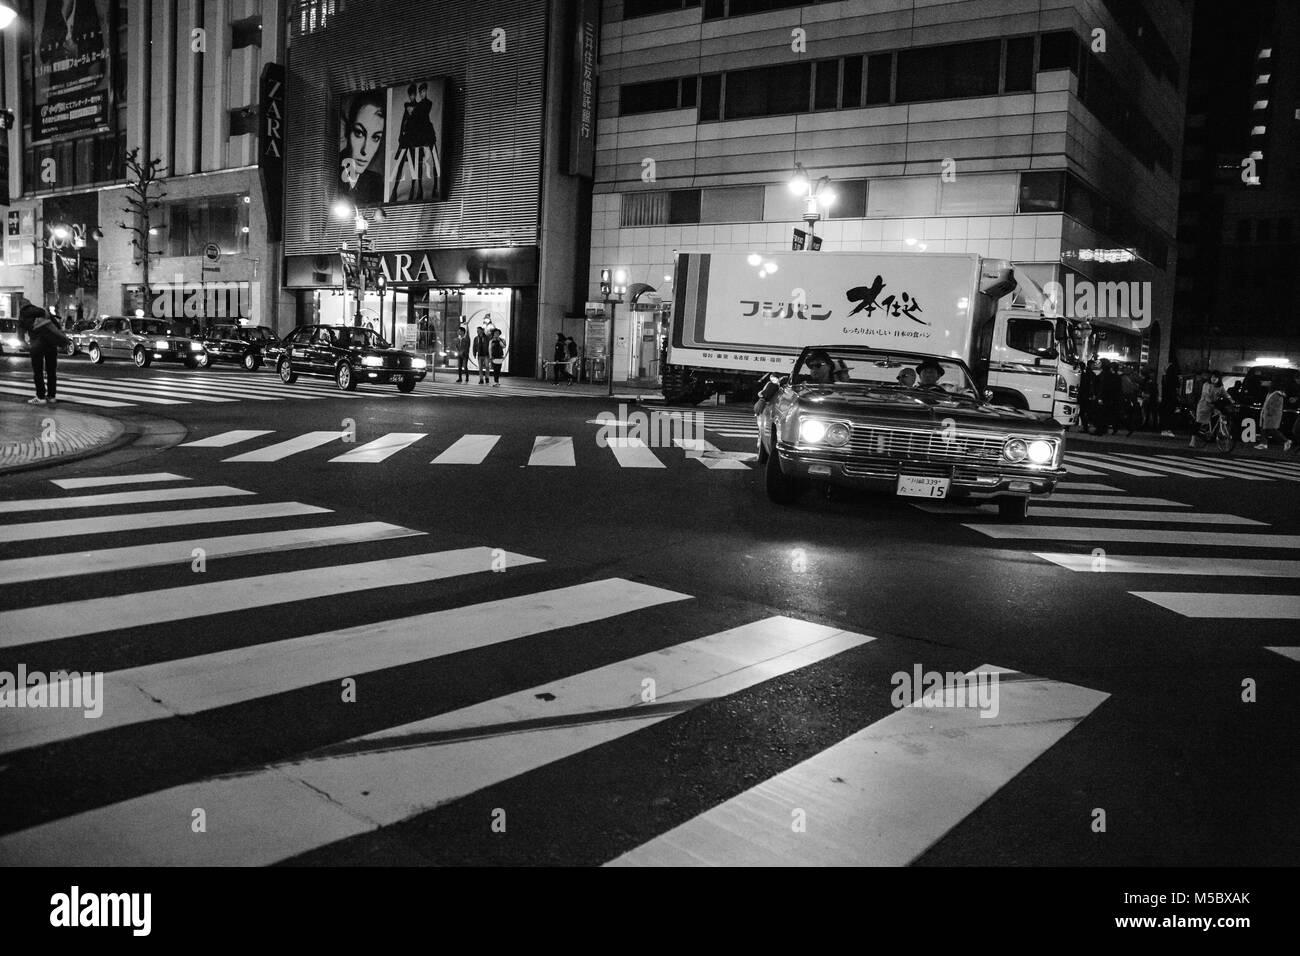 Vintage car cruising a city street - Stock Image